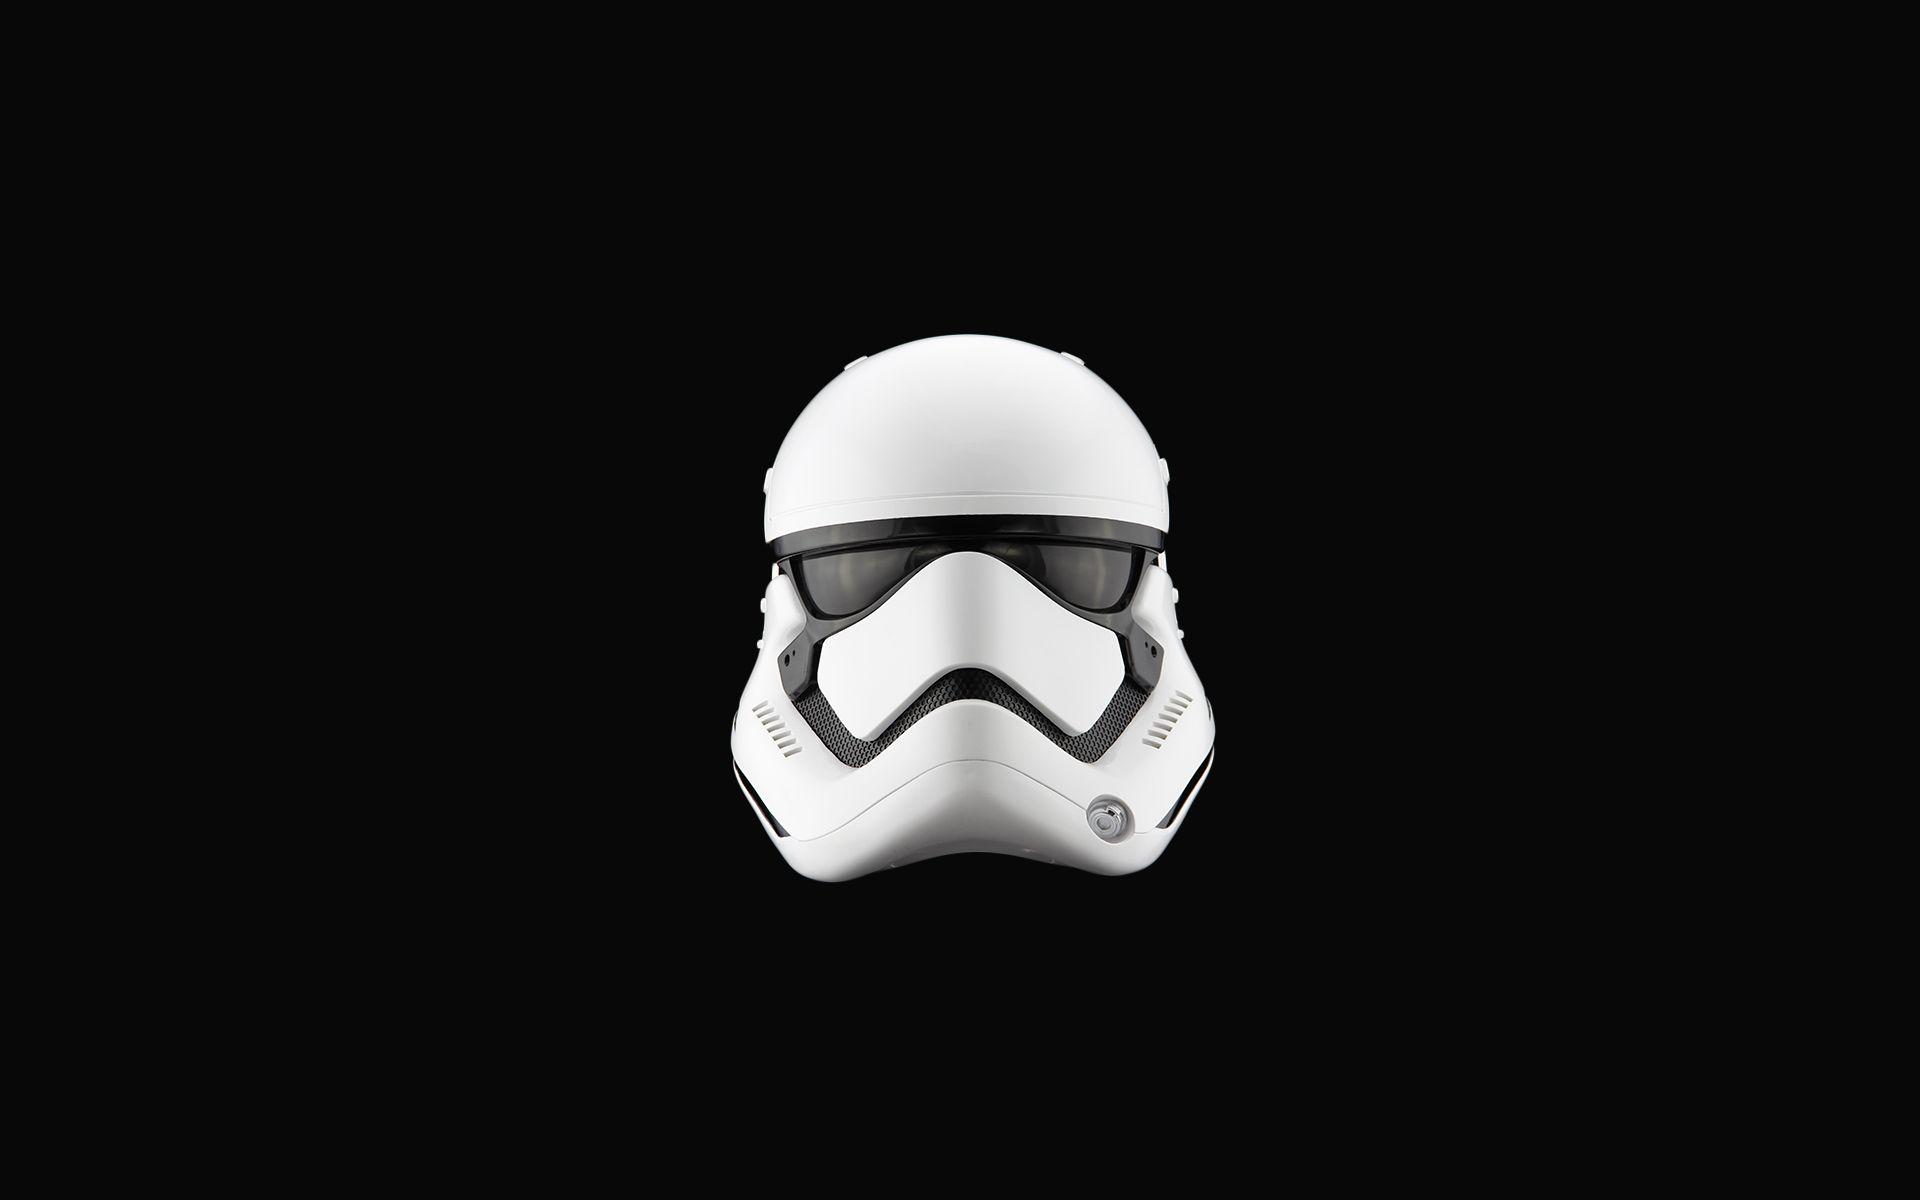 Stormtrooper Wallpaper 7ac